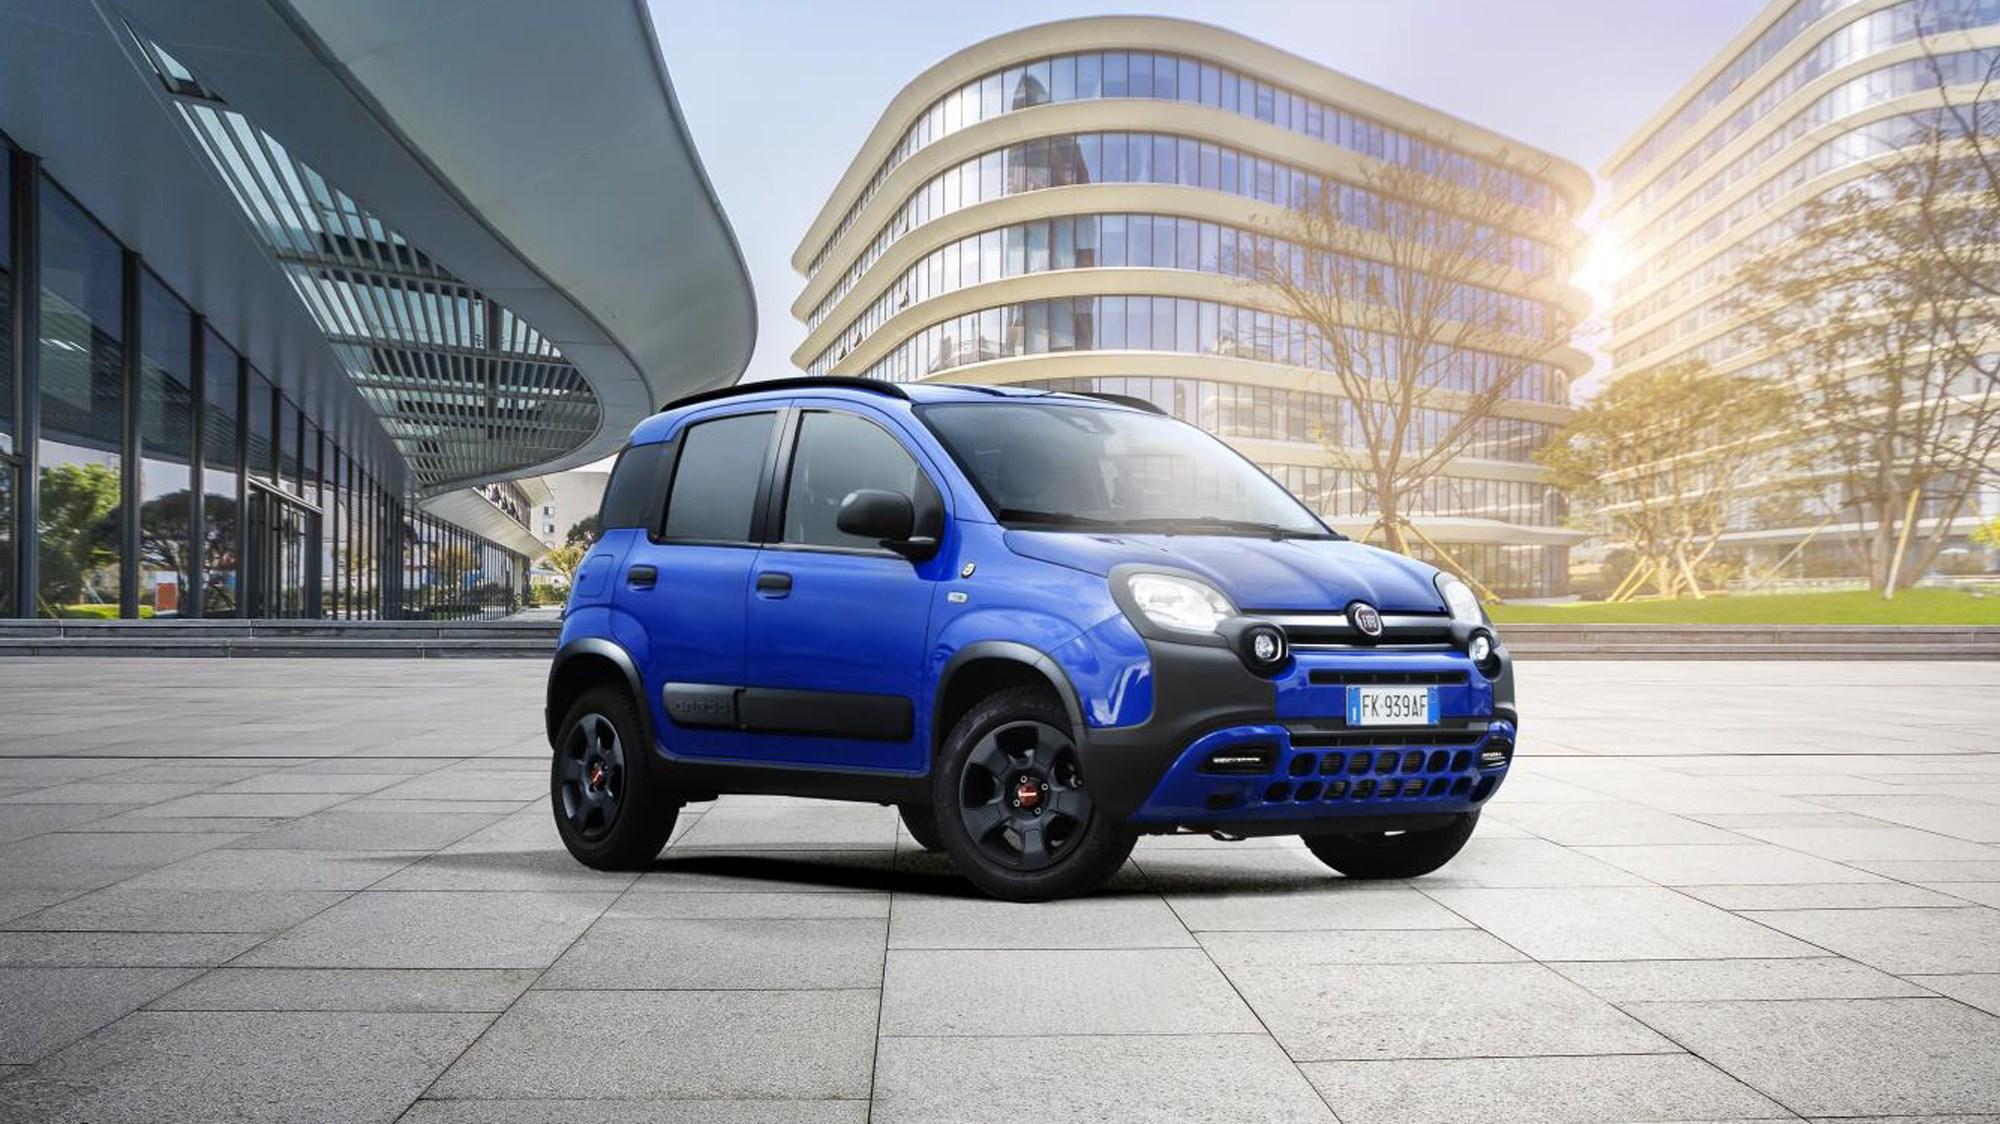 Panda Waze: Fiat's city car gets connected | CAR Magazine